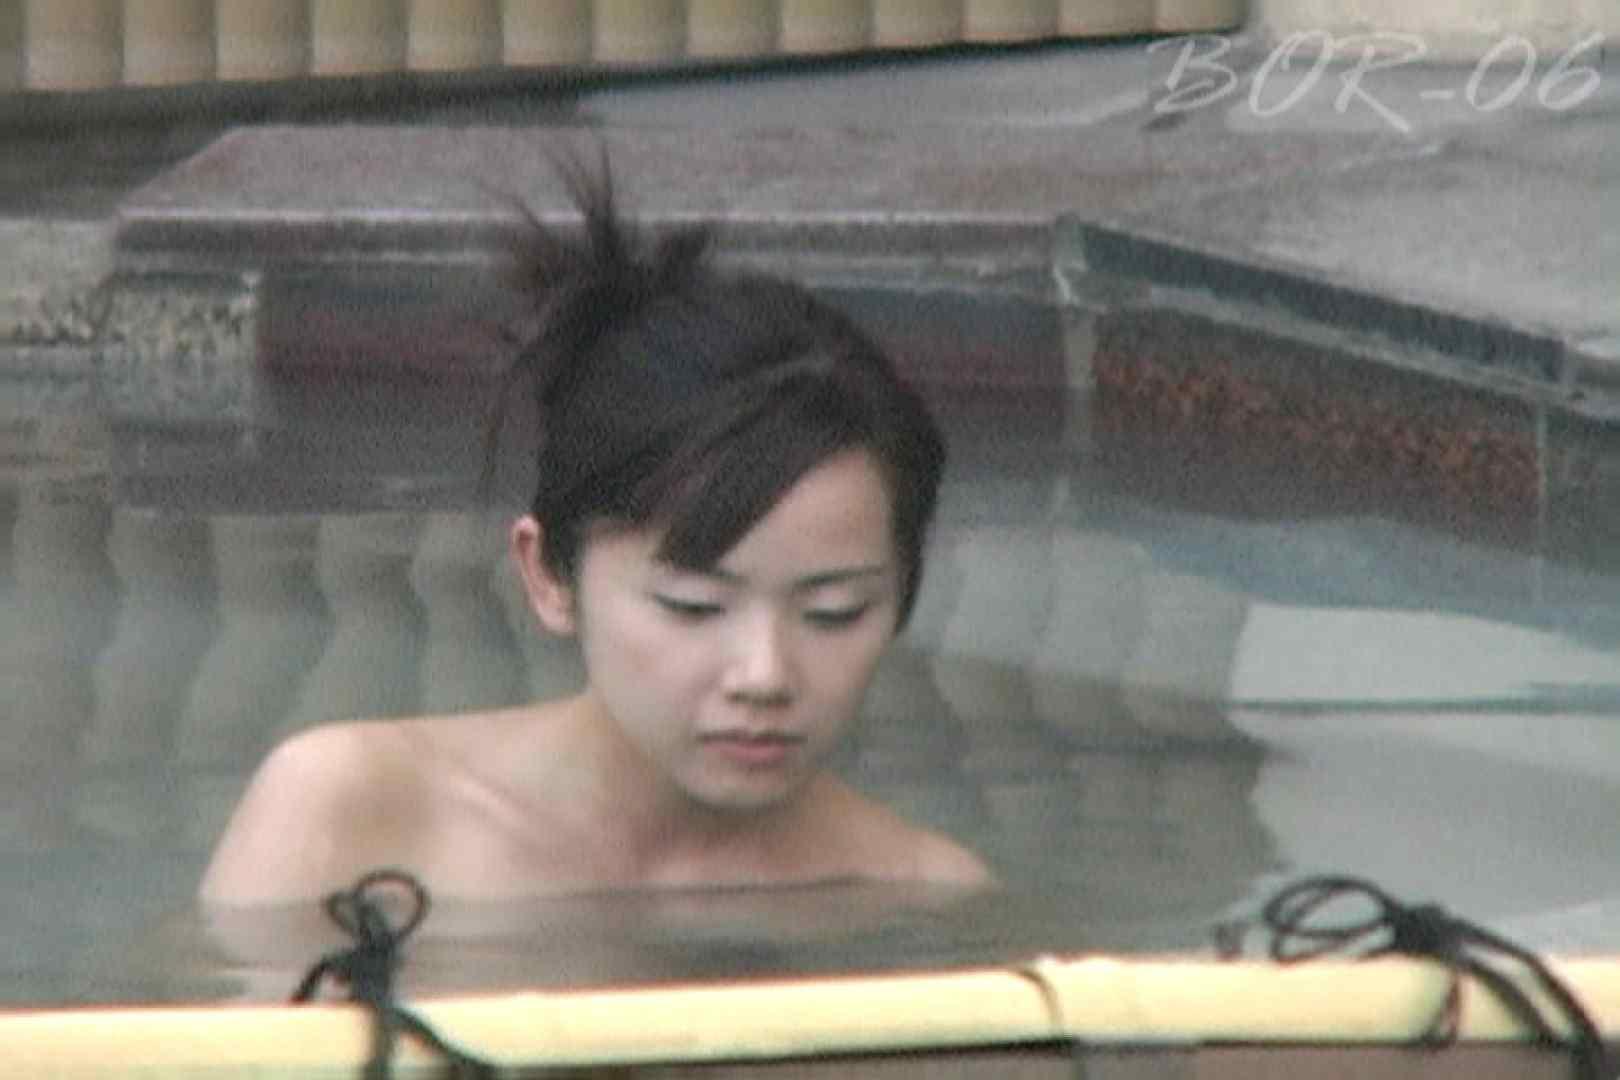 Aquaな露天風呂Vol.521 OLセックス  92画像 60